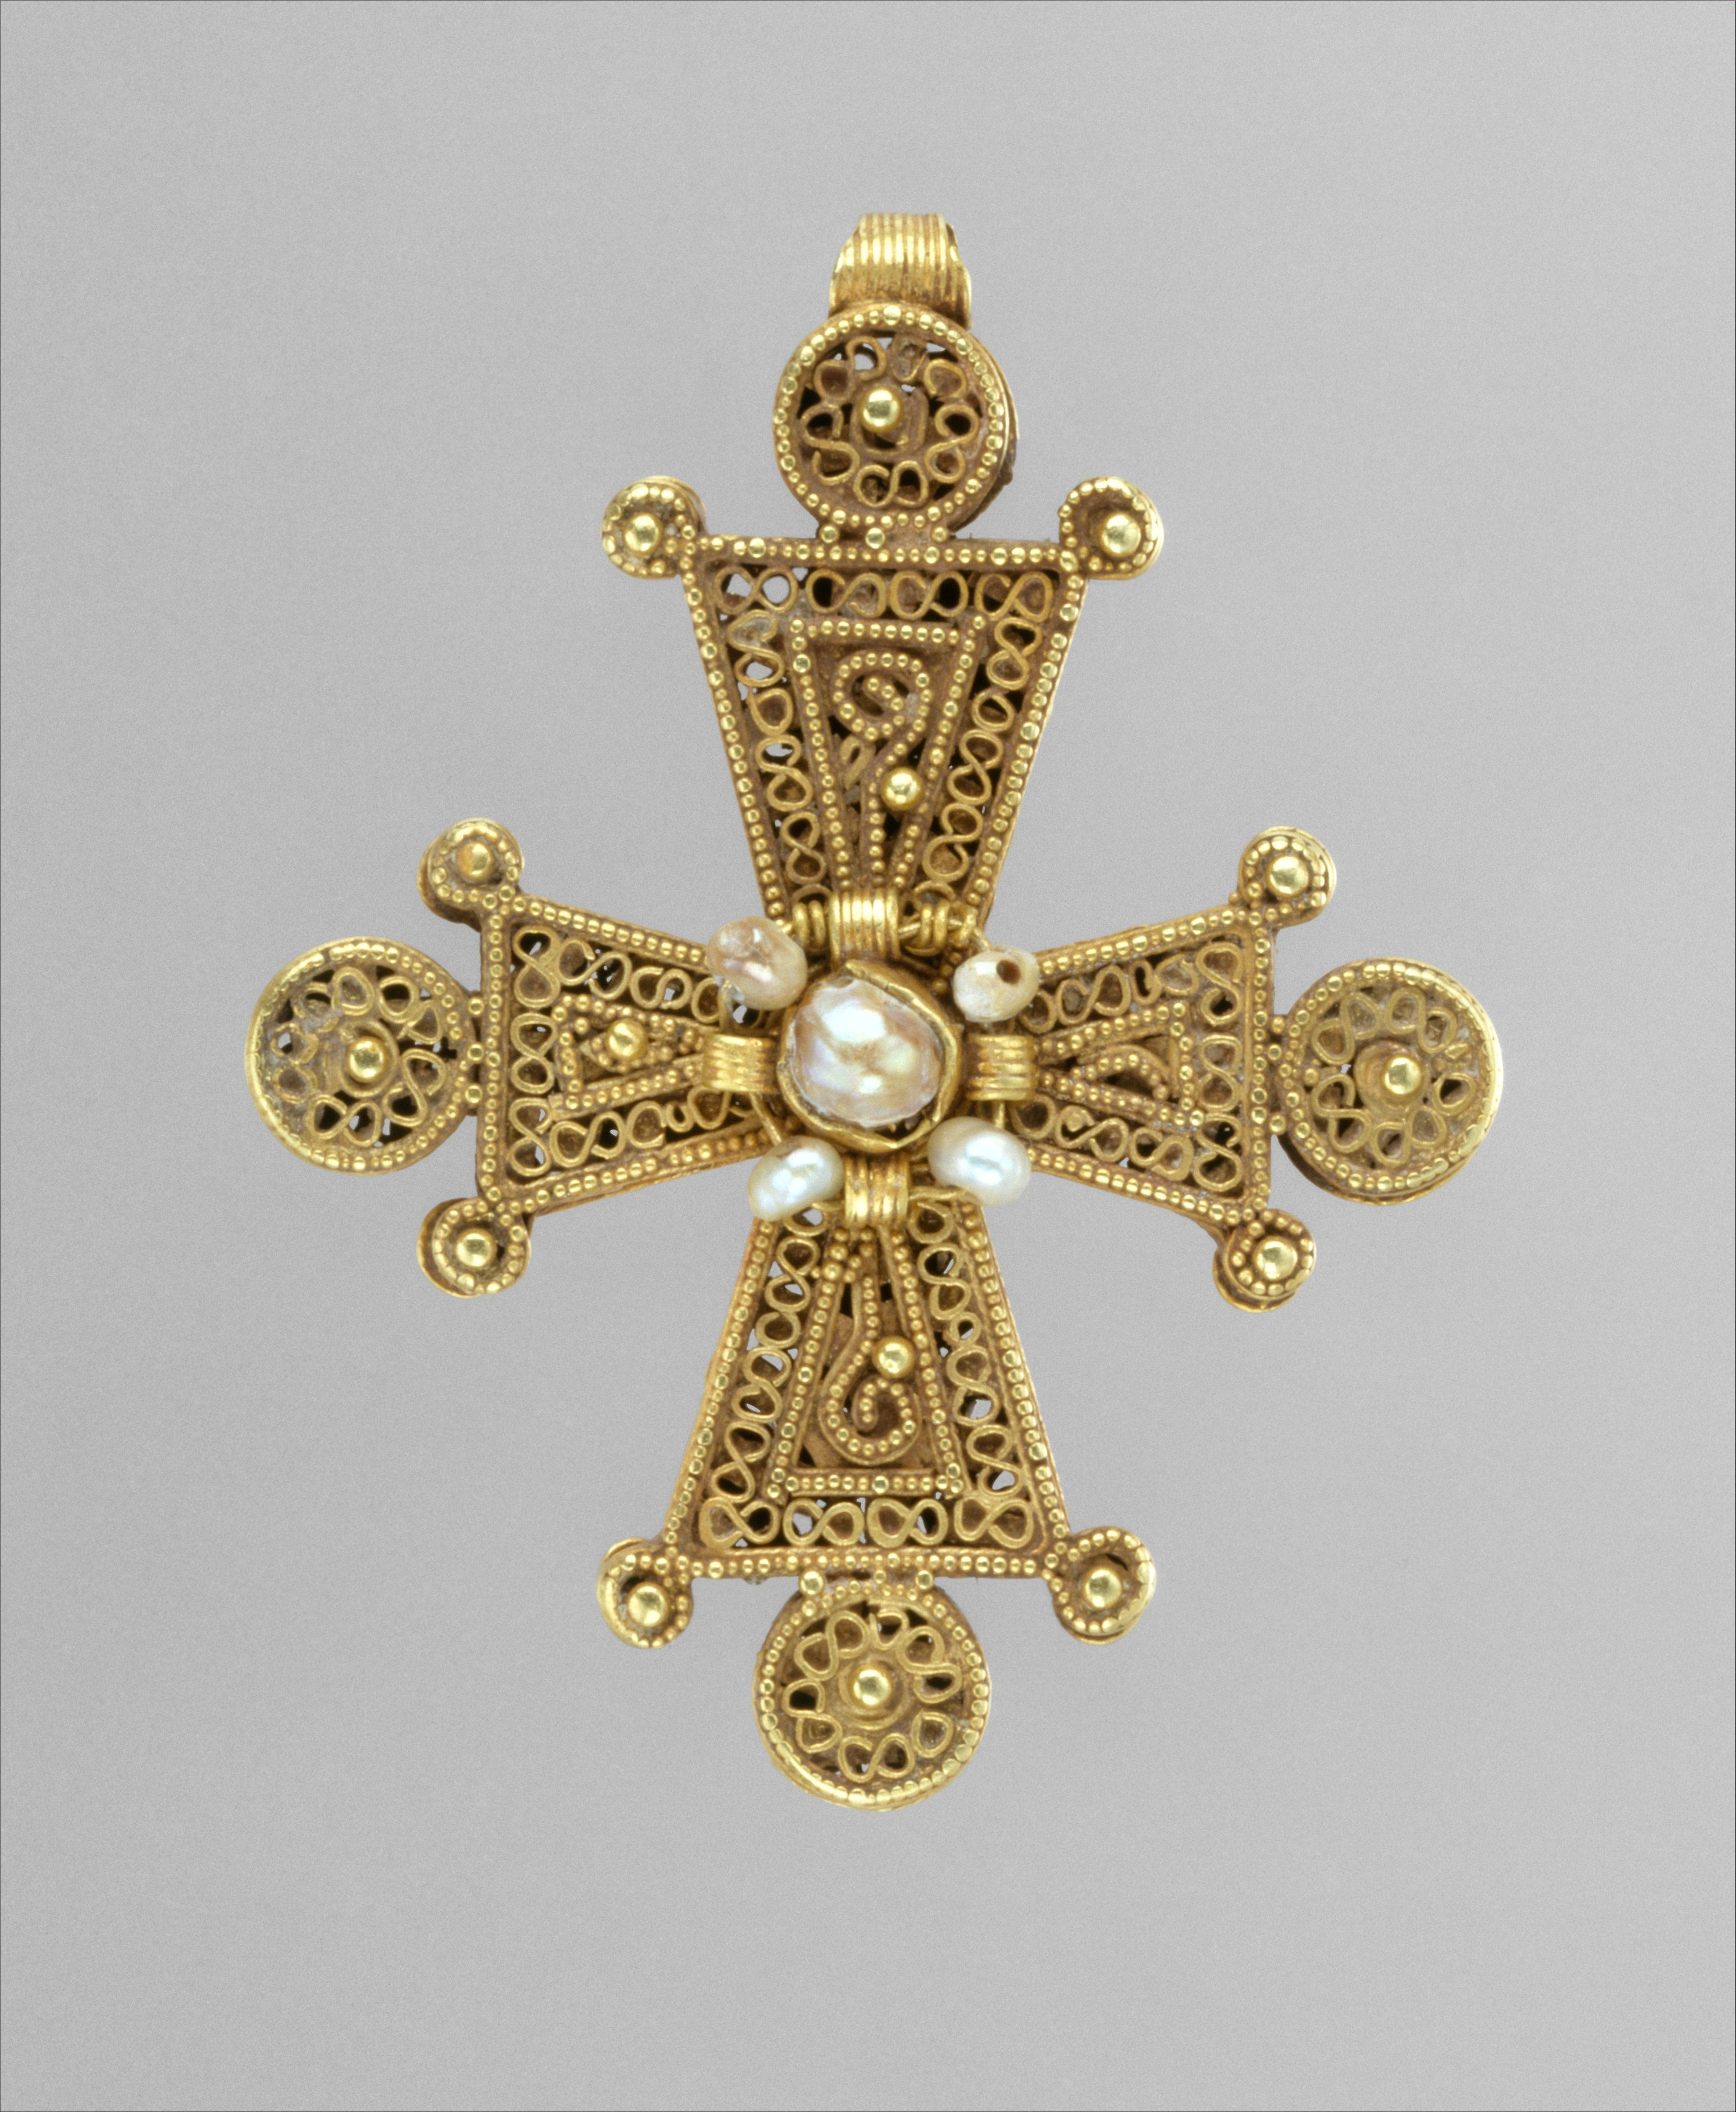 A 14th Century Cross 13th century jewelry o...